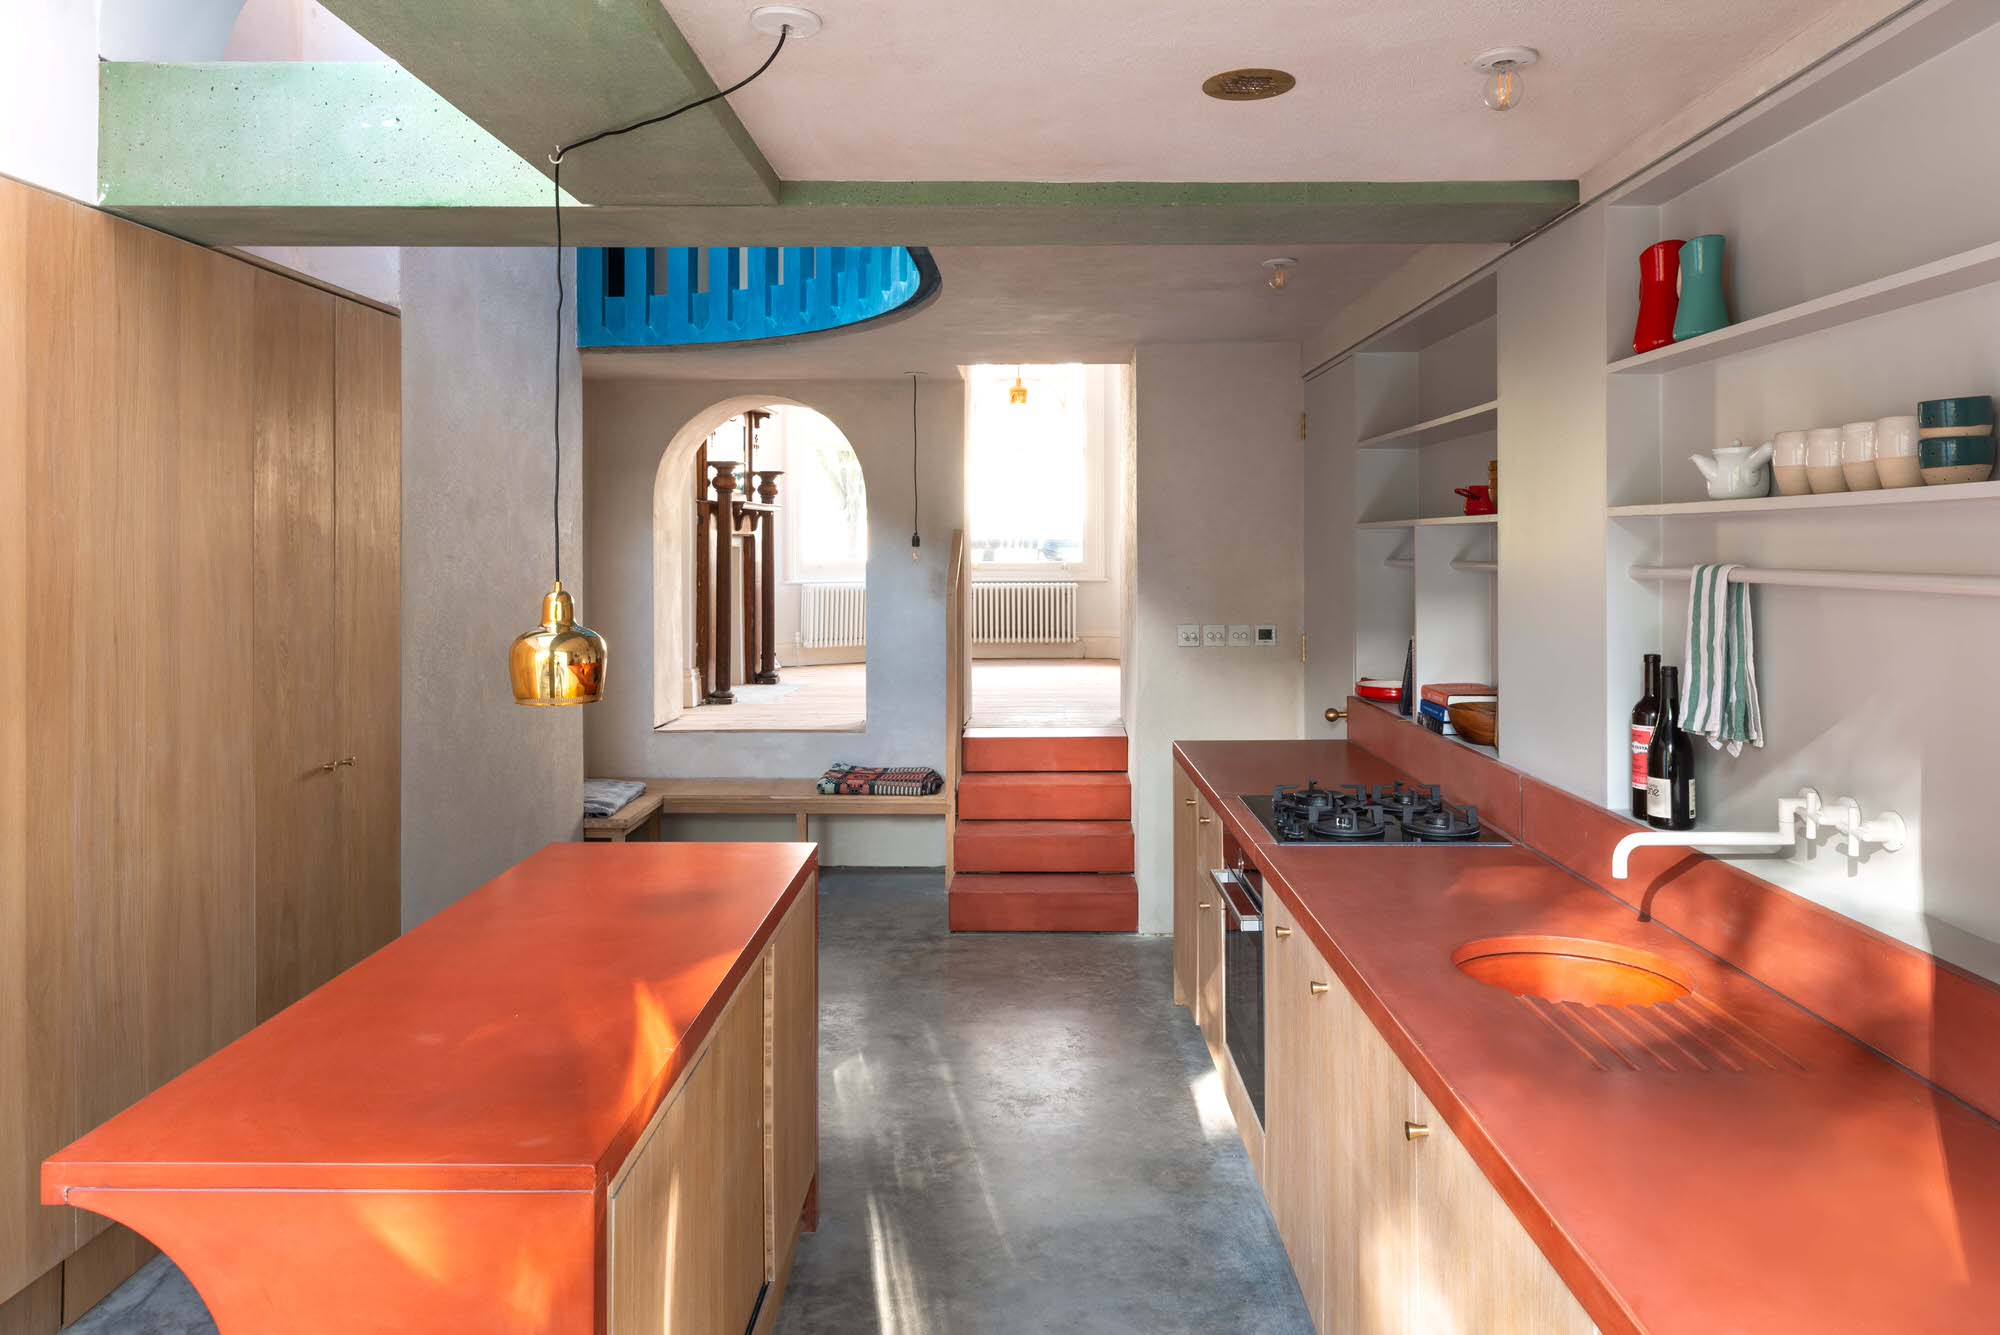 Studio Ben Allen House Recast London Residential Architecture Photo French+tye Yellowtrace 06